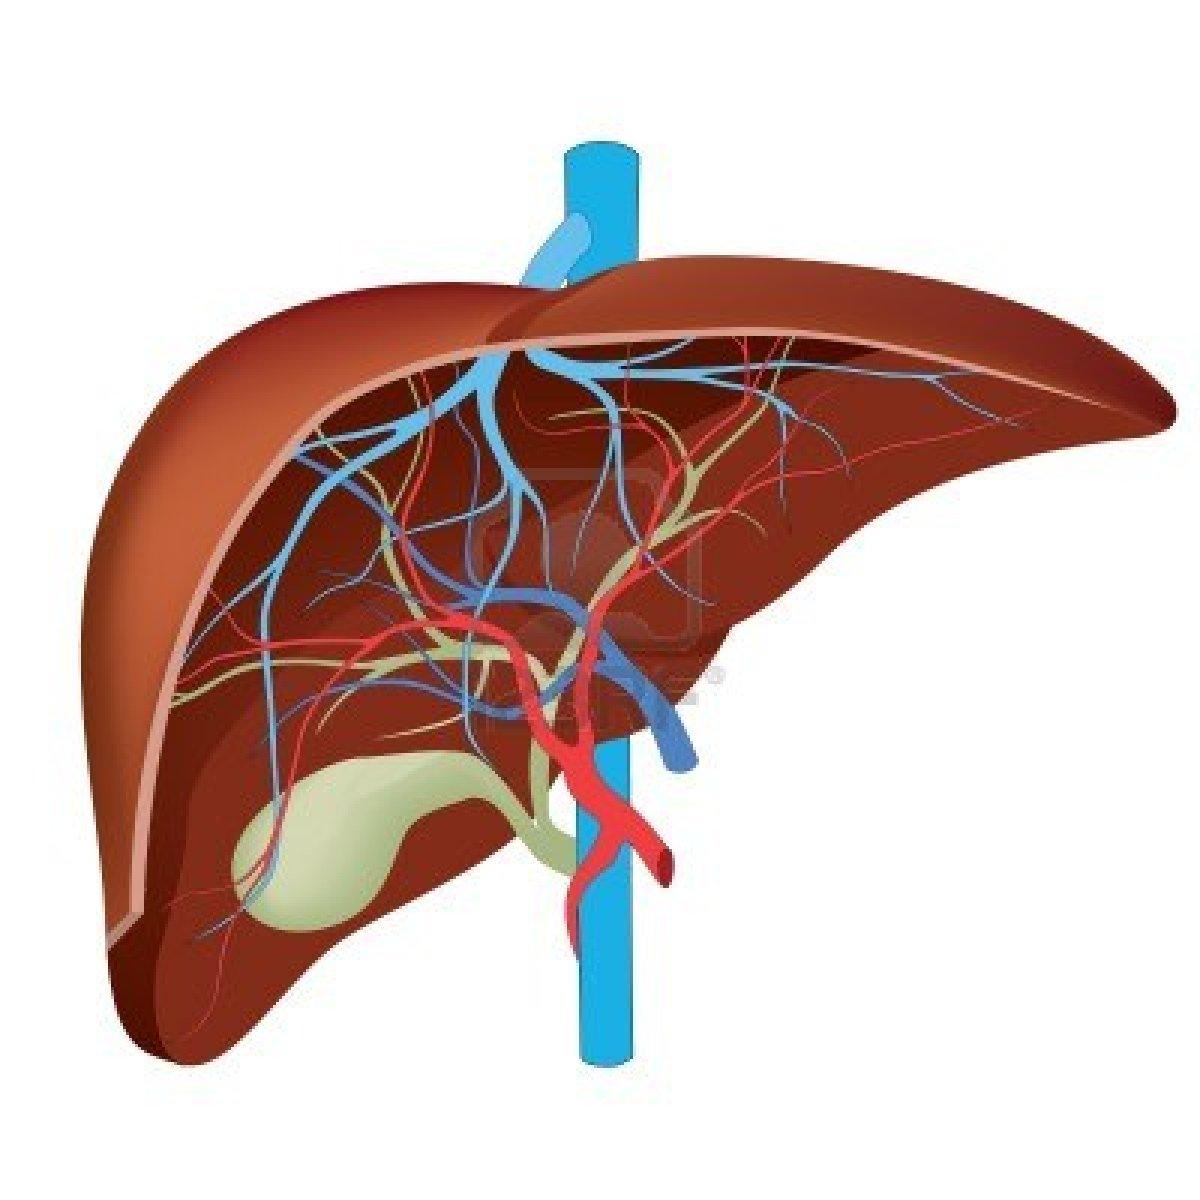 Human liver location diagram human liver location diagram photo3 ccuart Choice Image